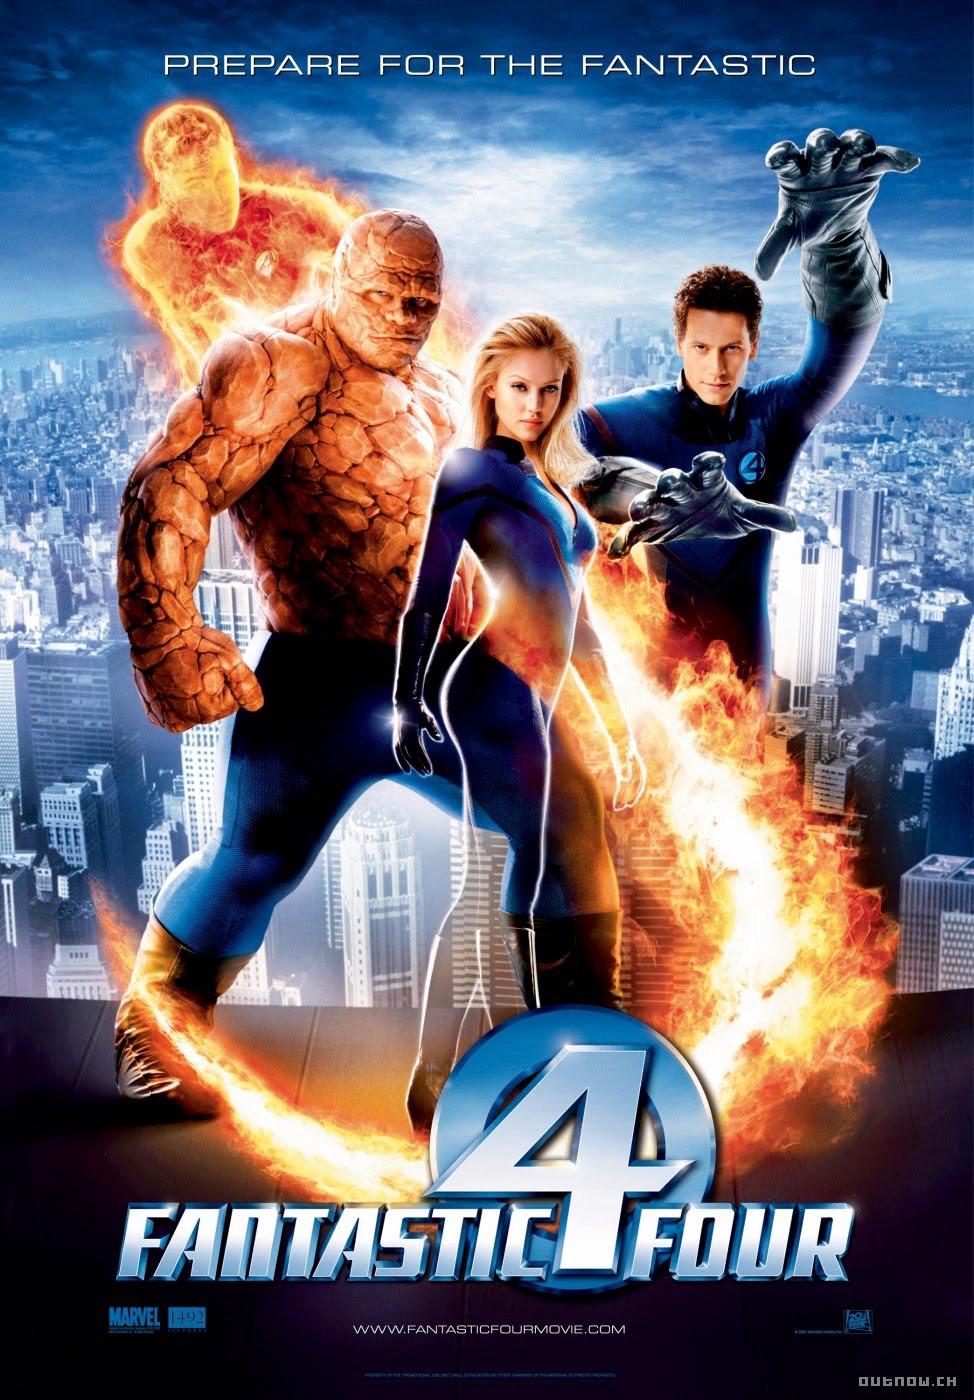 Fantastic 4, 2005